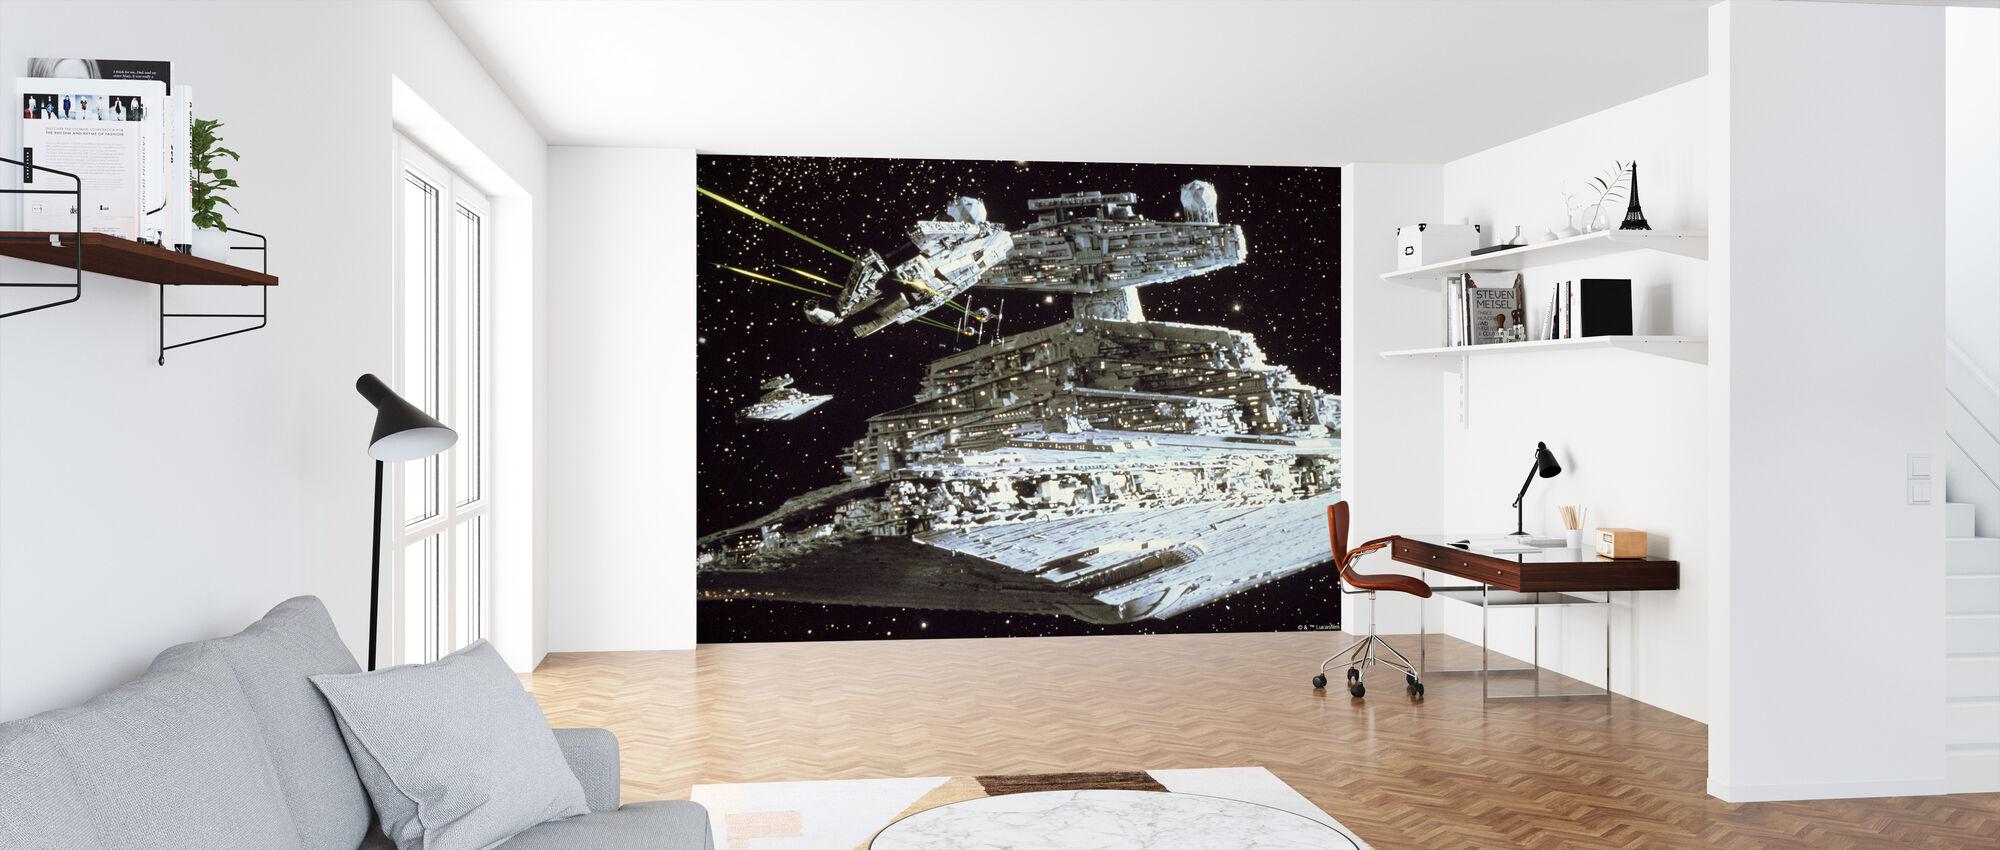 Star Wars - Millennium Falcon angreb - Tapet - Kontor